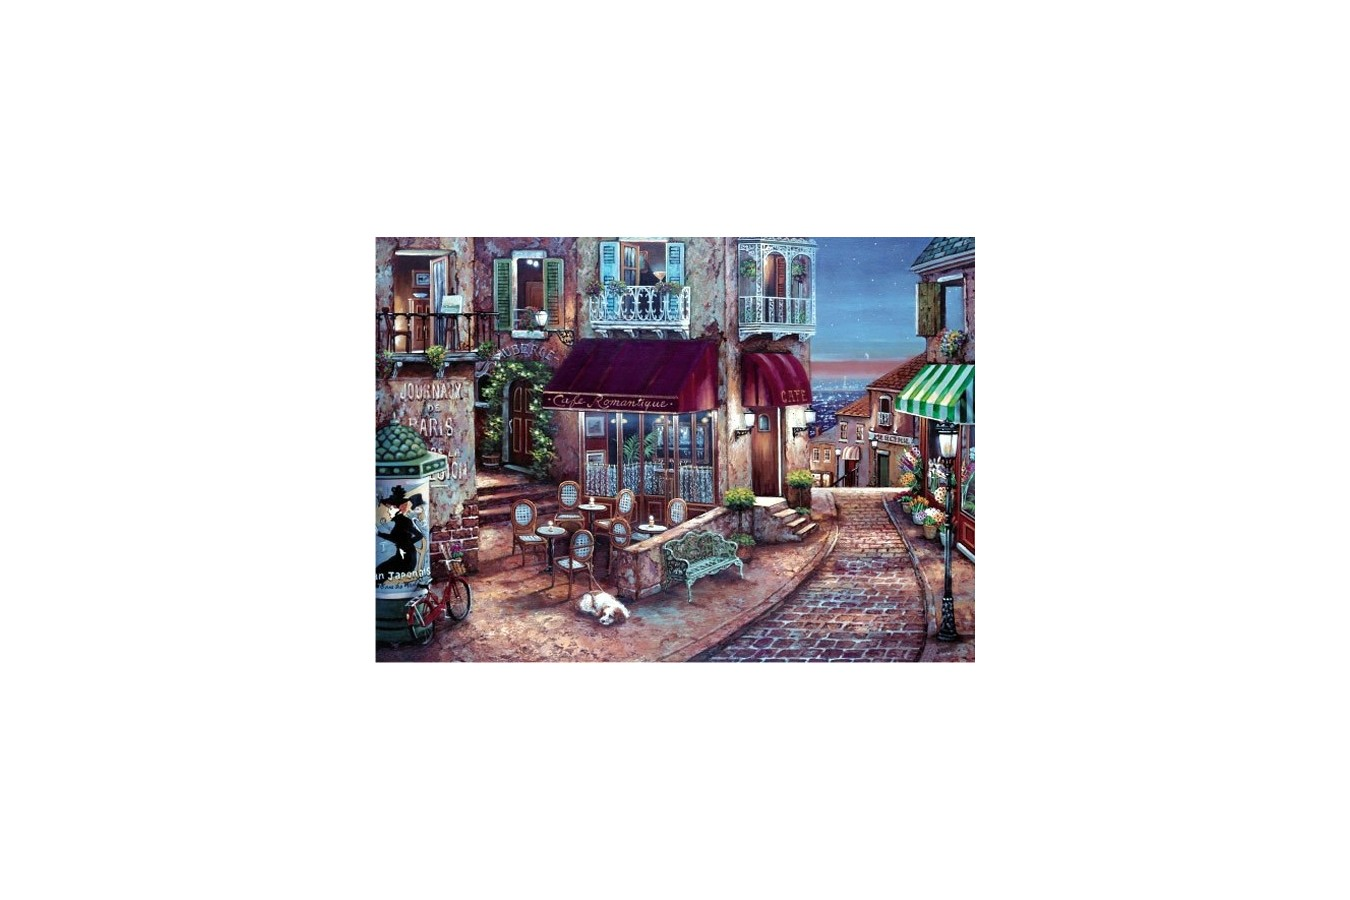 Puzzle Anatolian - Cafe Romantique, 1500 piese (4516)